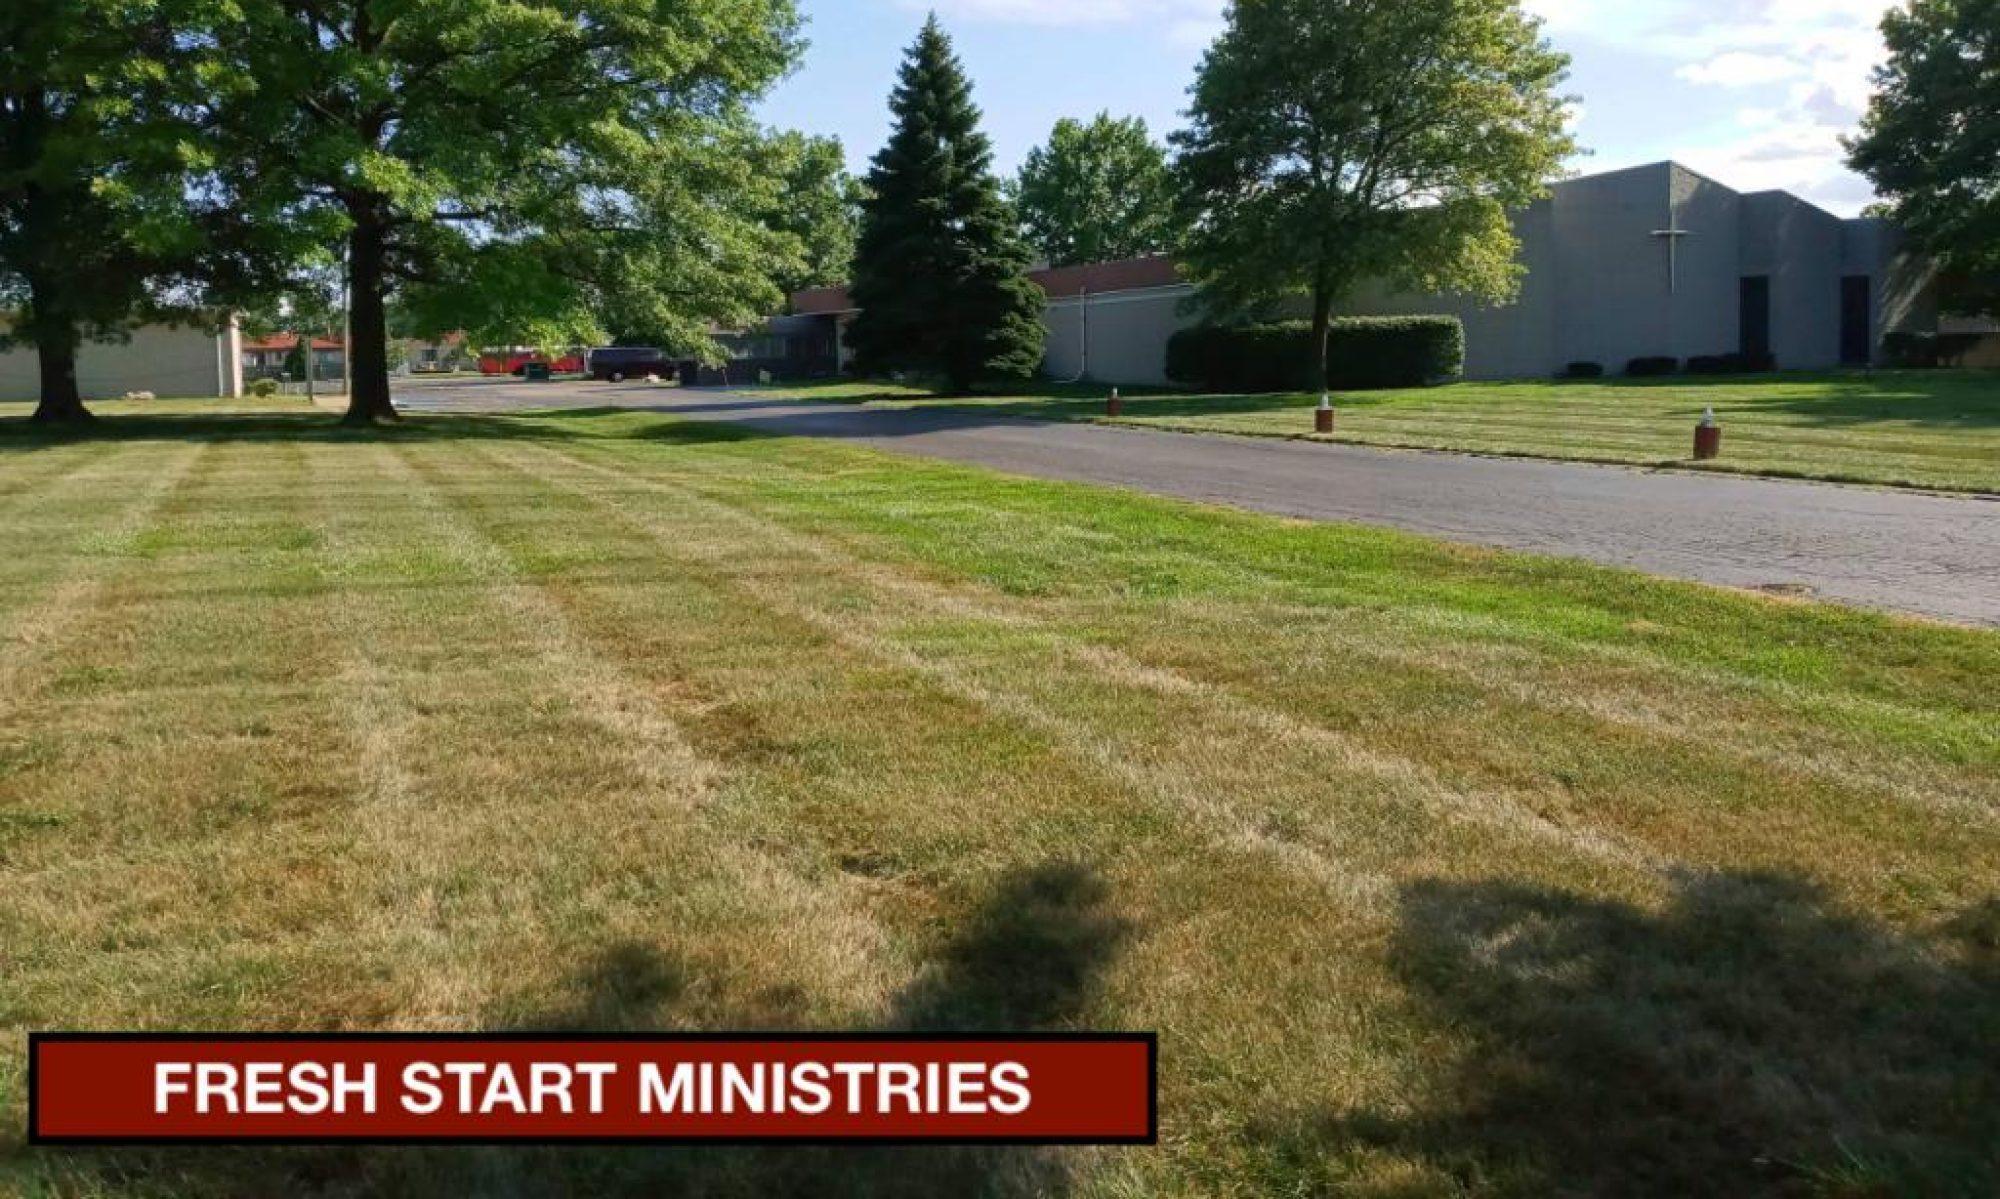 Fresh Start Ministries